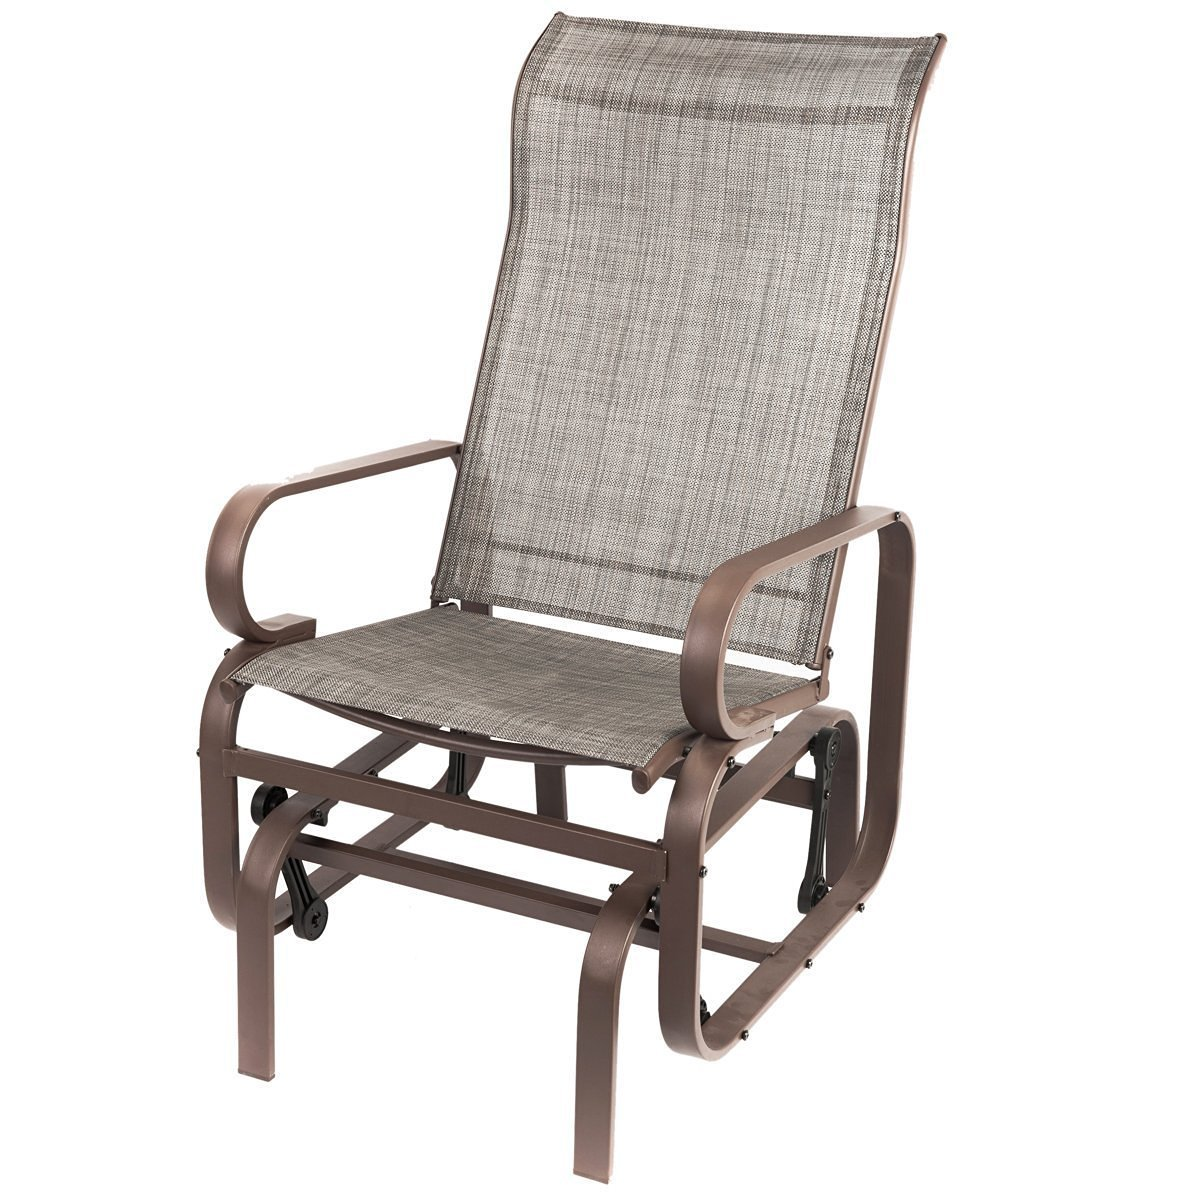 rocker glider chair minnie mouse high banner naturefun outdoor patio balcony rocking lounge all weatherproof gray walmart com